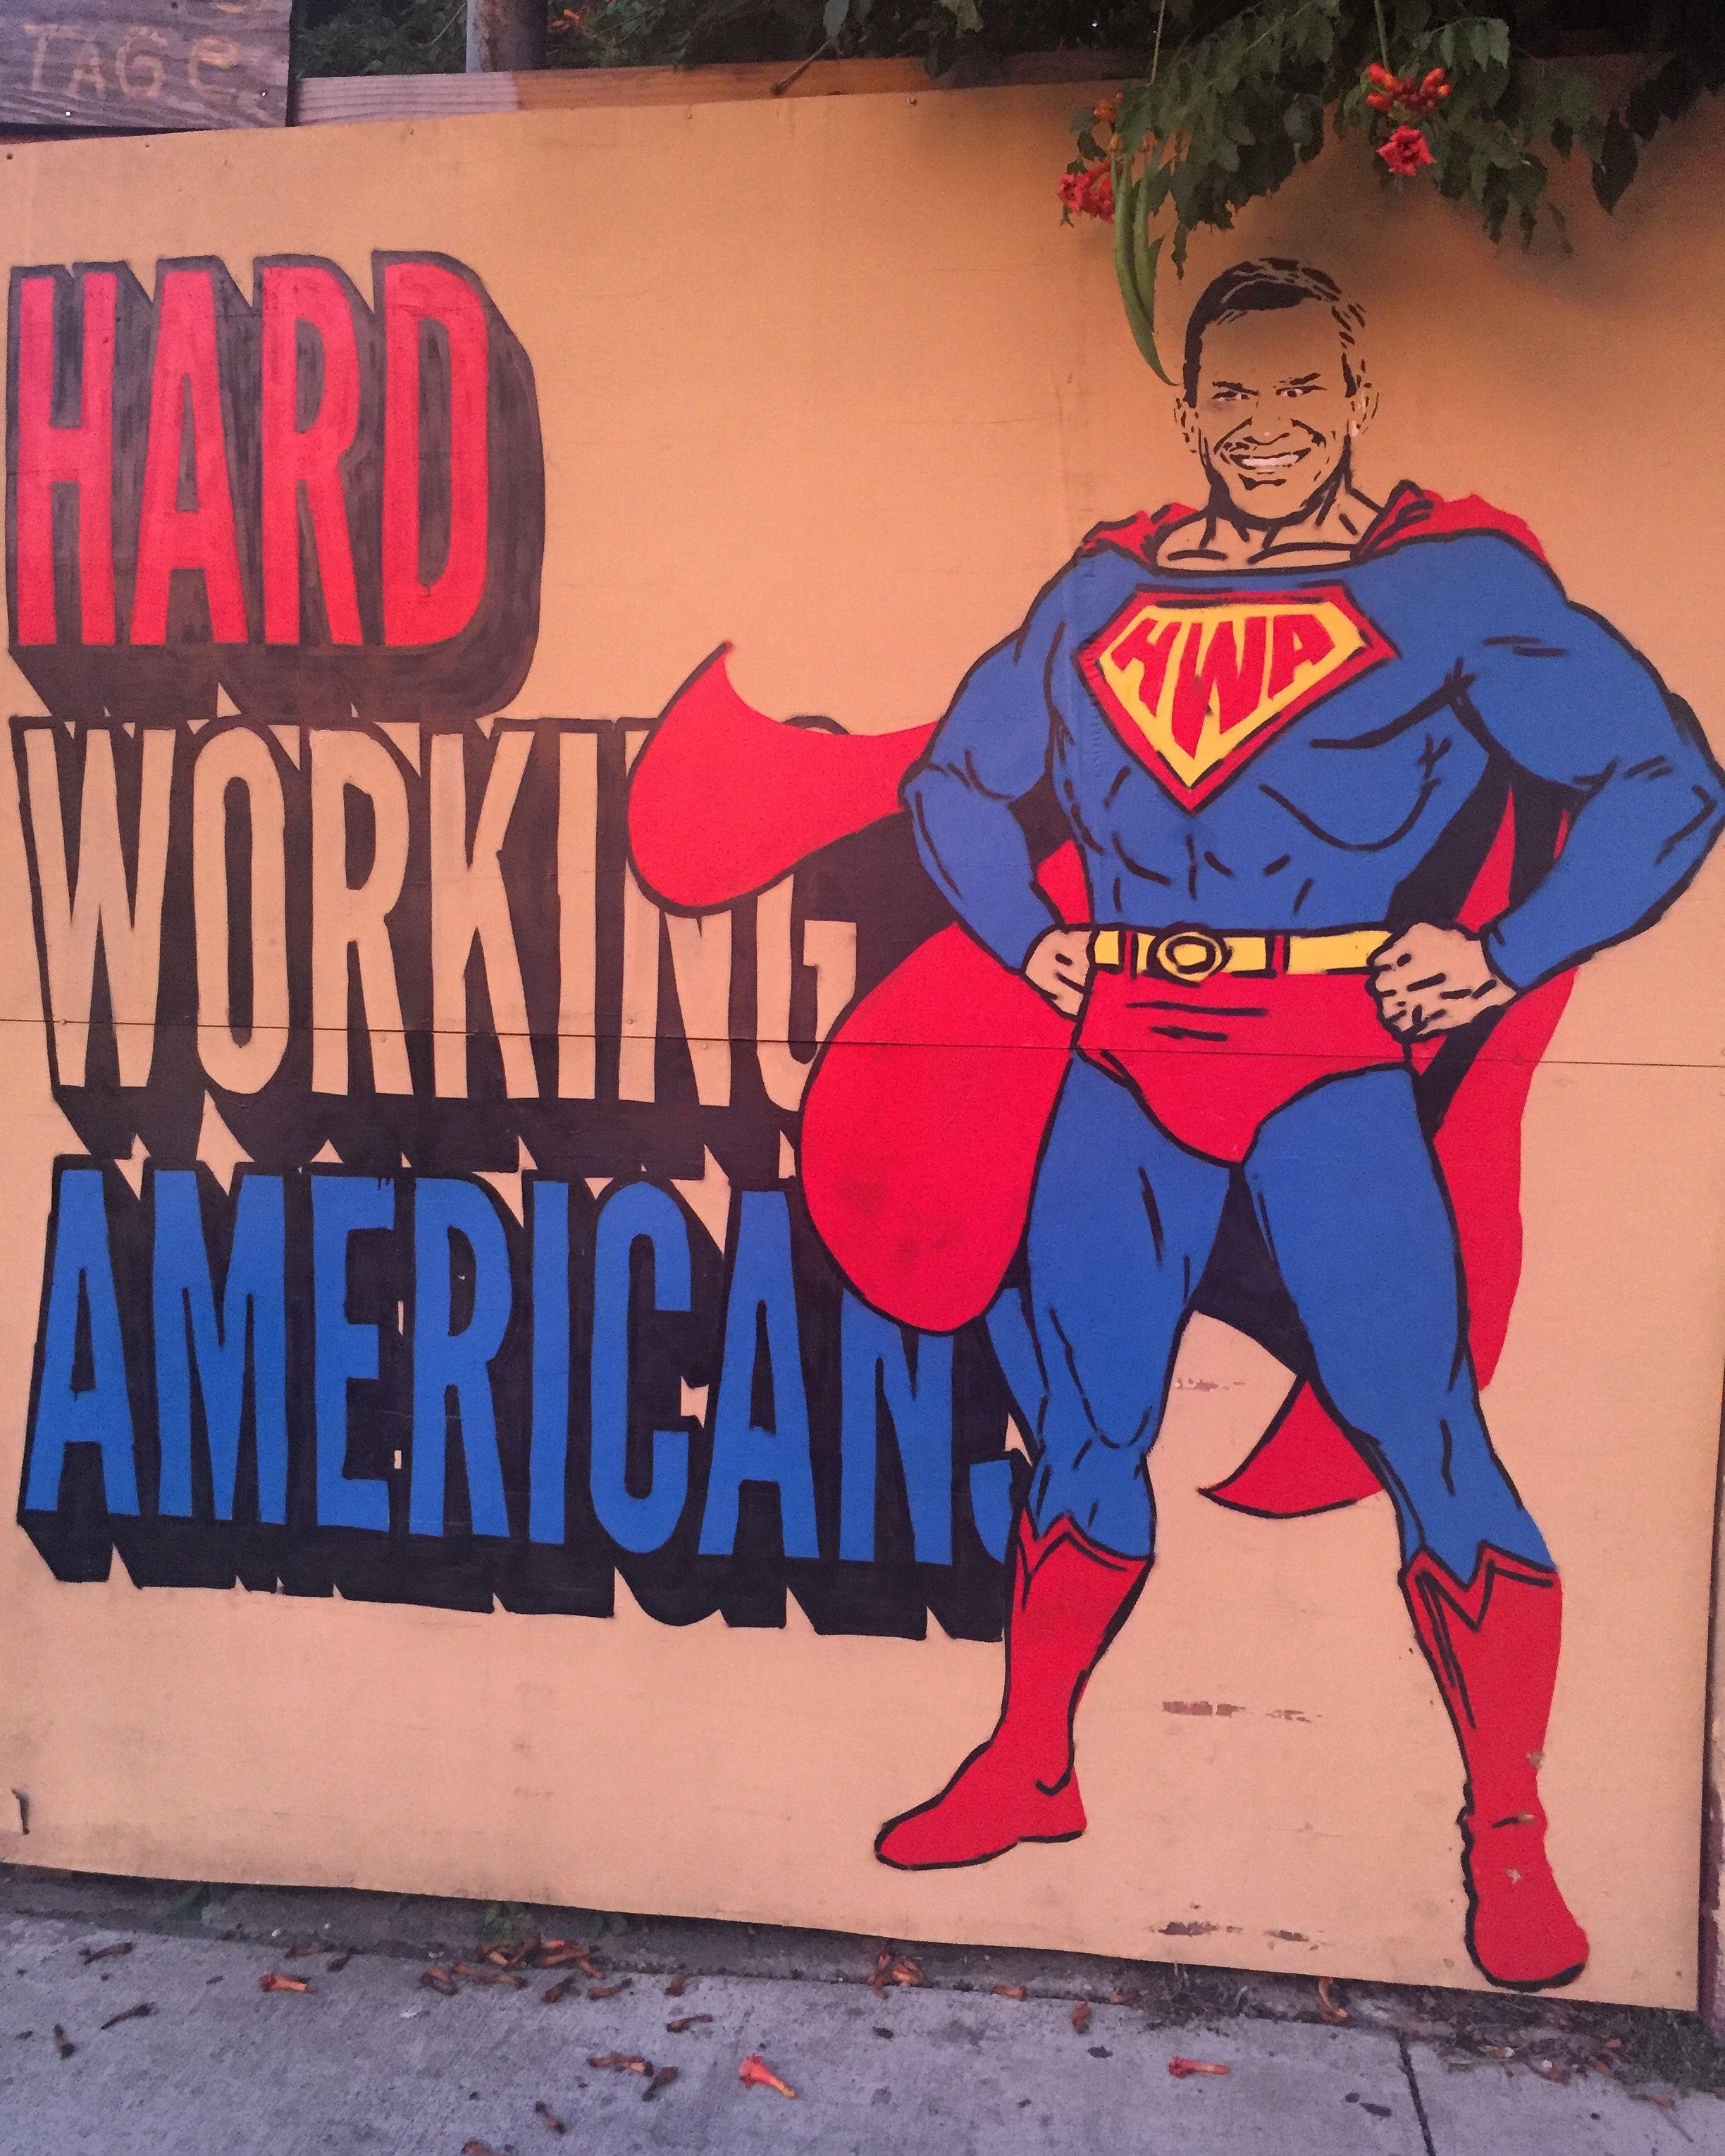 #covernashville #hardworkingamerican #hardworking #american #superman #eastnashville #streetart #mural #fivepoints #nashville #art